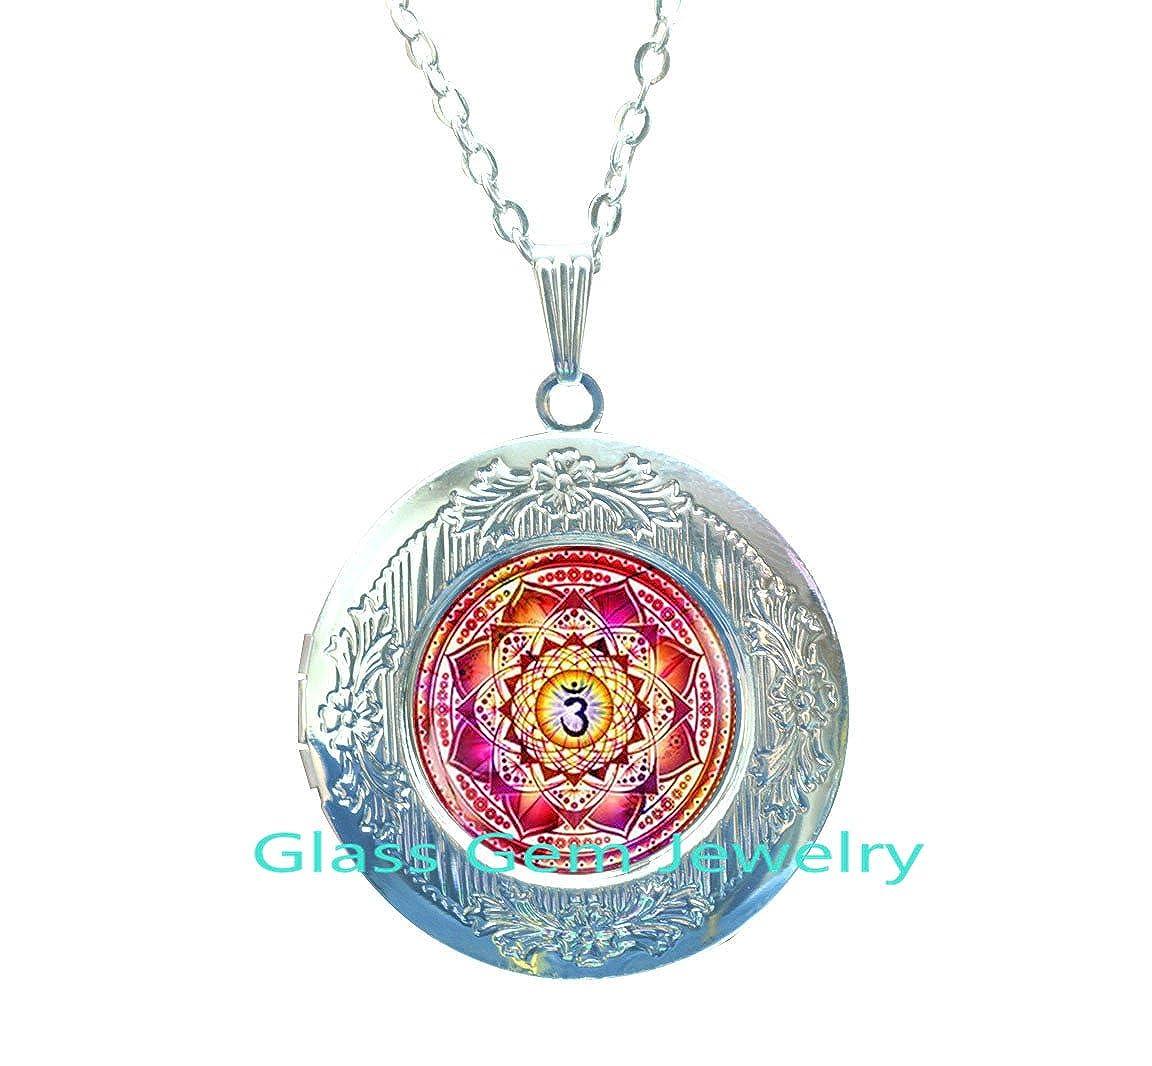 Yoga Meditation Locket Pendant Sacred geometry Locket Necklace,Q002xianghe xianglian Spiritual Yoga Jewelry gift Locket Third eye chakra Locket Necklace